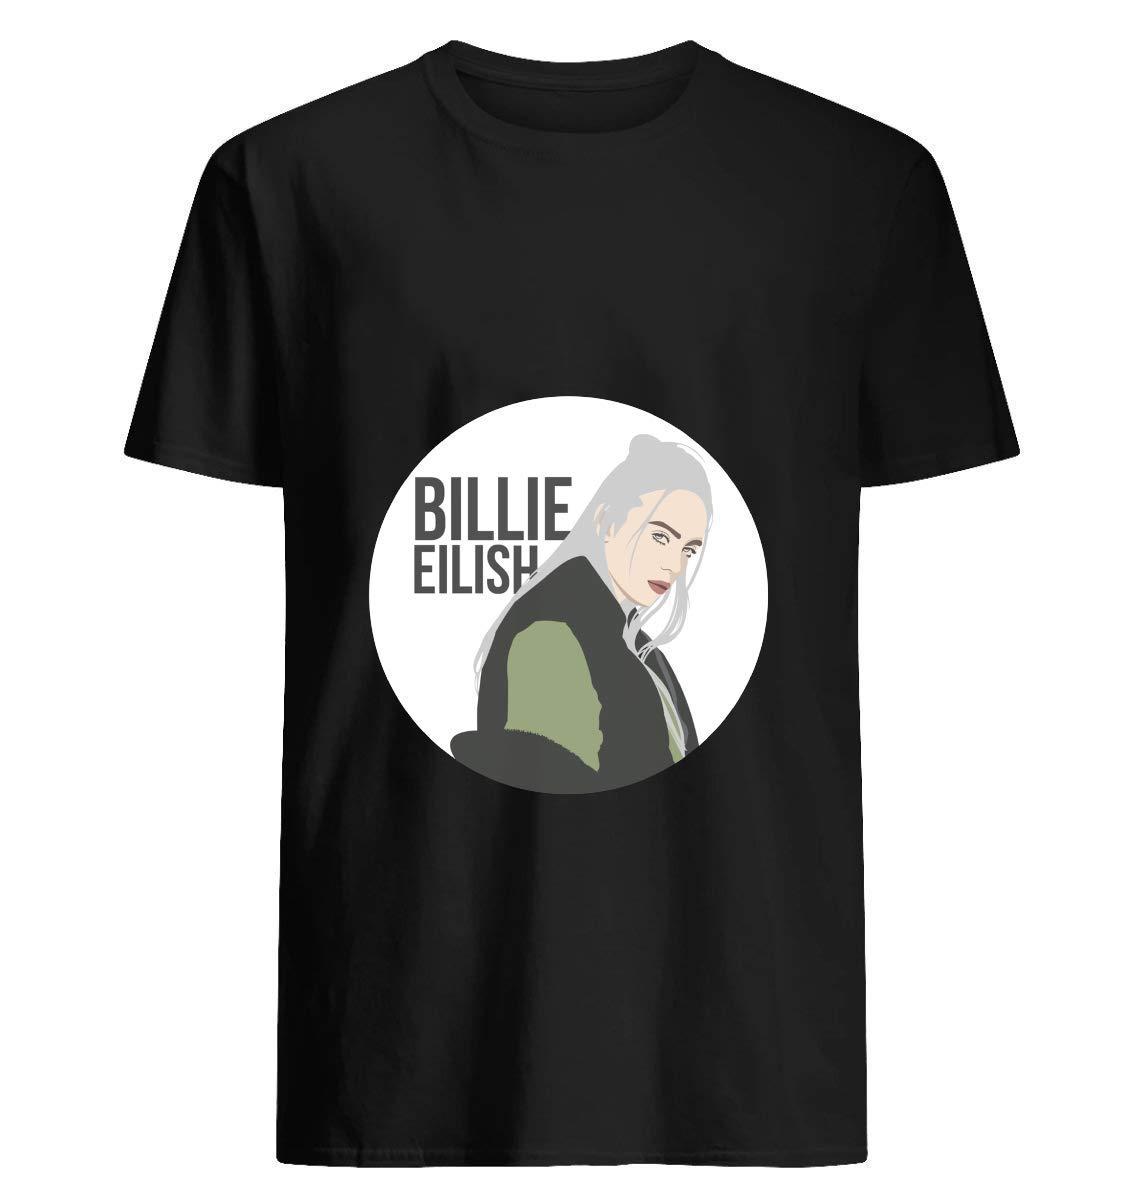 Billie Eilish 94 T Shirt For Unisex